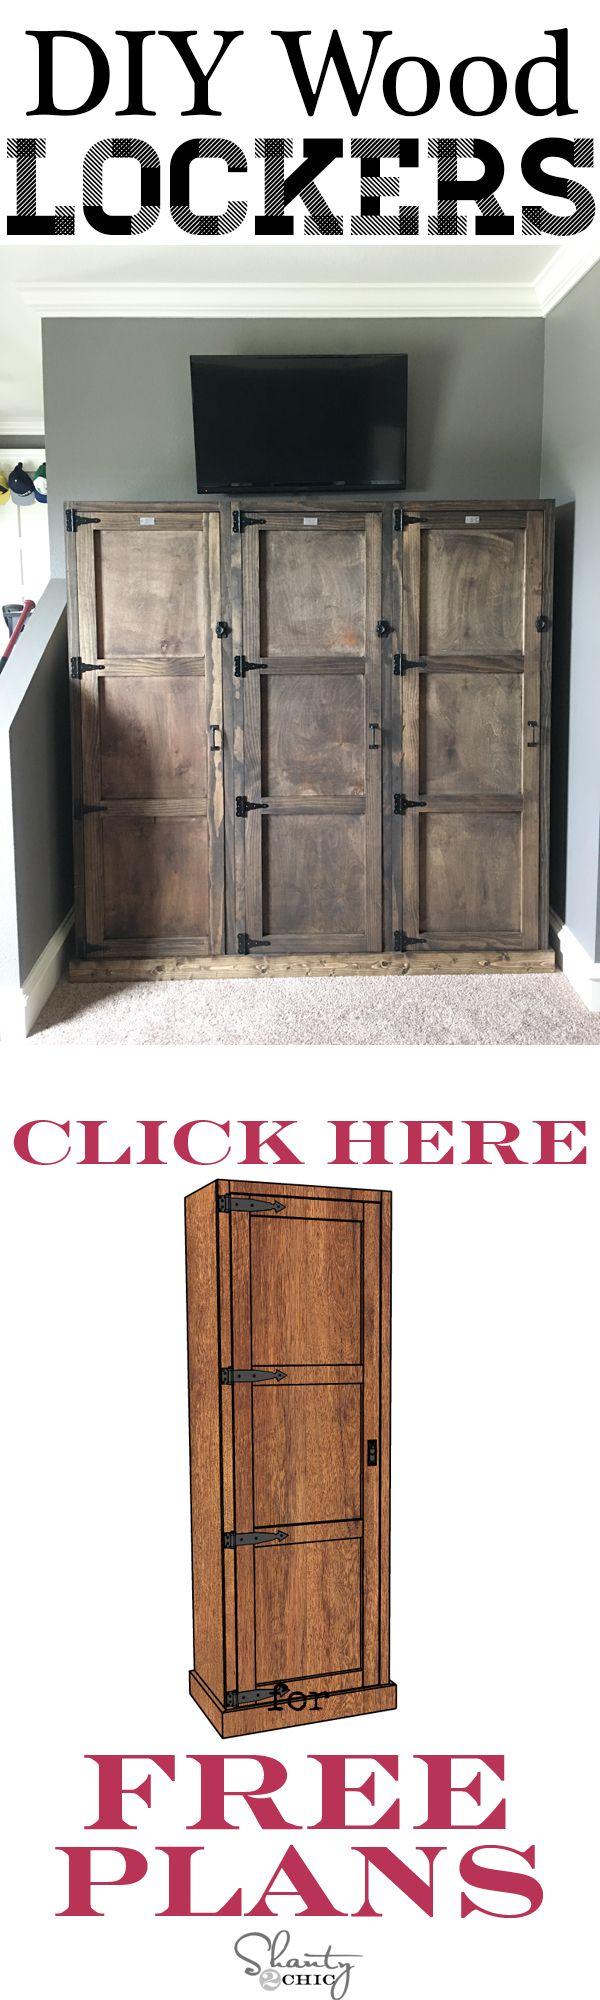 Best 25 garage lockers ideas on pinterest garage entry for Build your own garage plans free